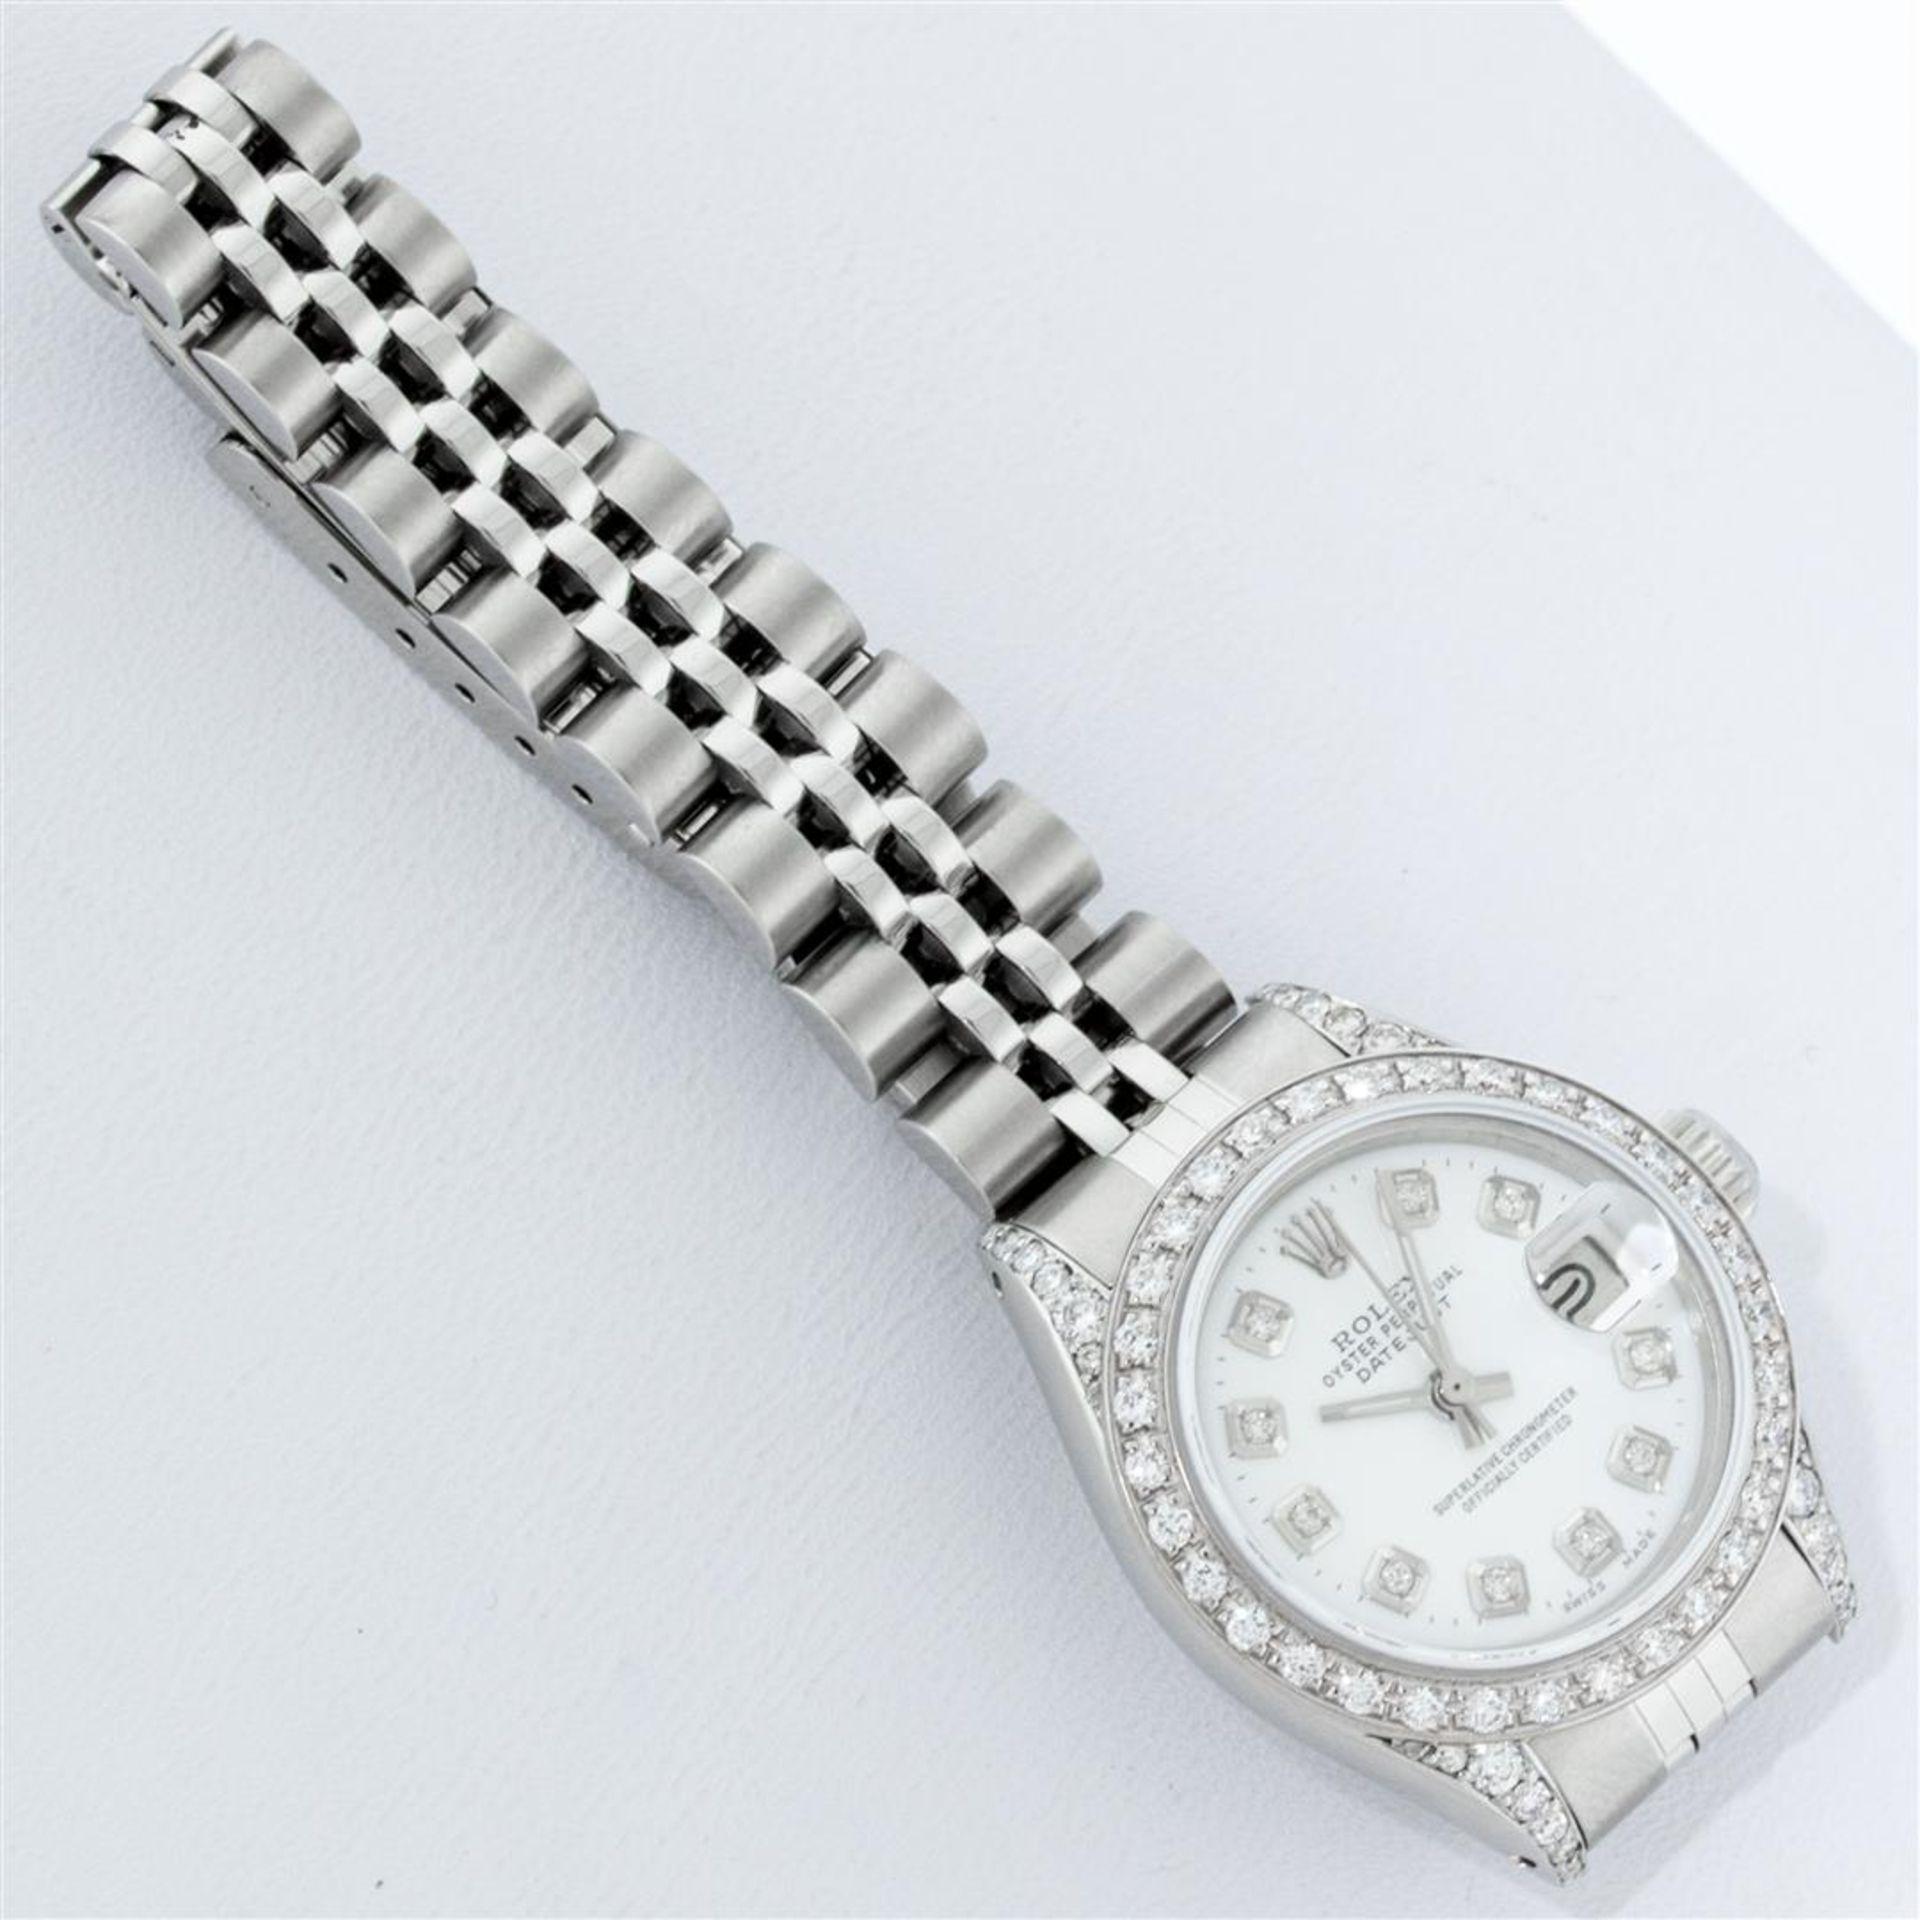 Rolex Ladies Stainless Steel White Diamond Lugs & Datejust Wristwatch - Image 7 of 9